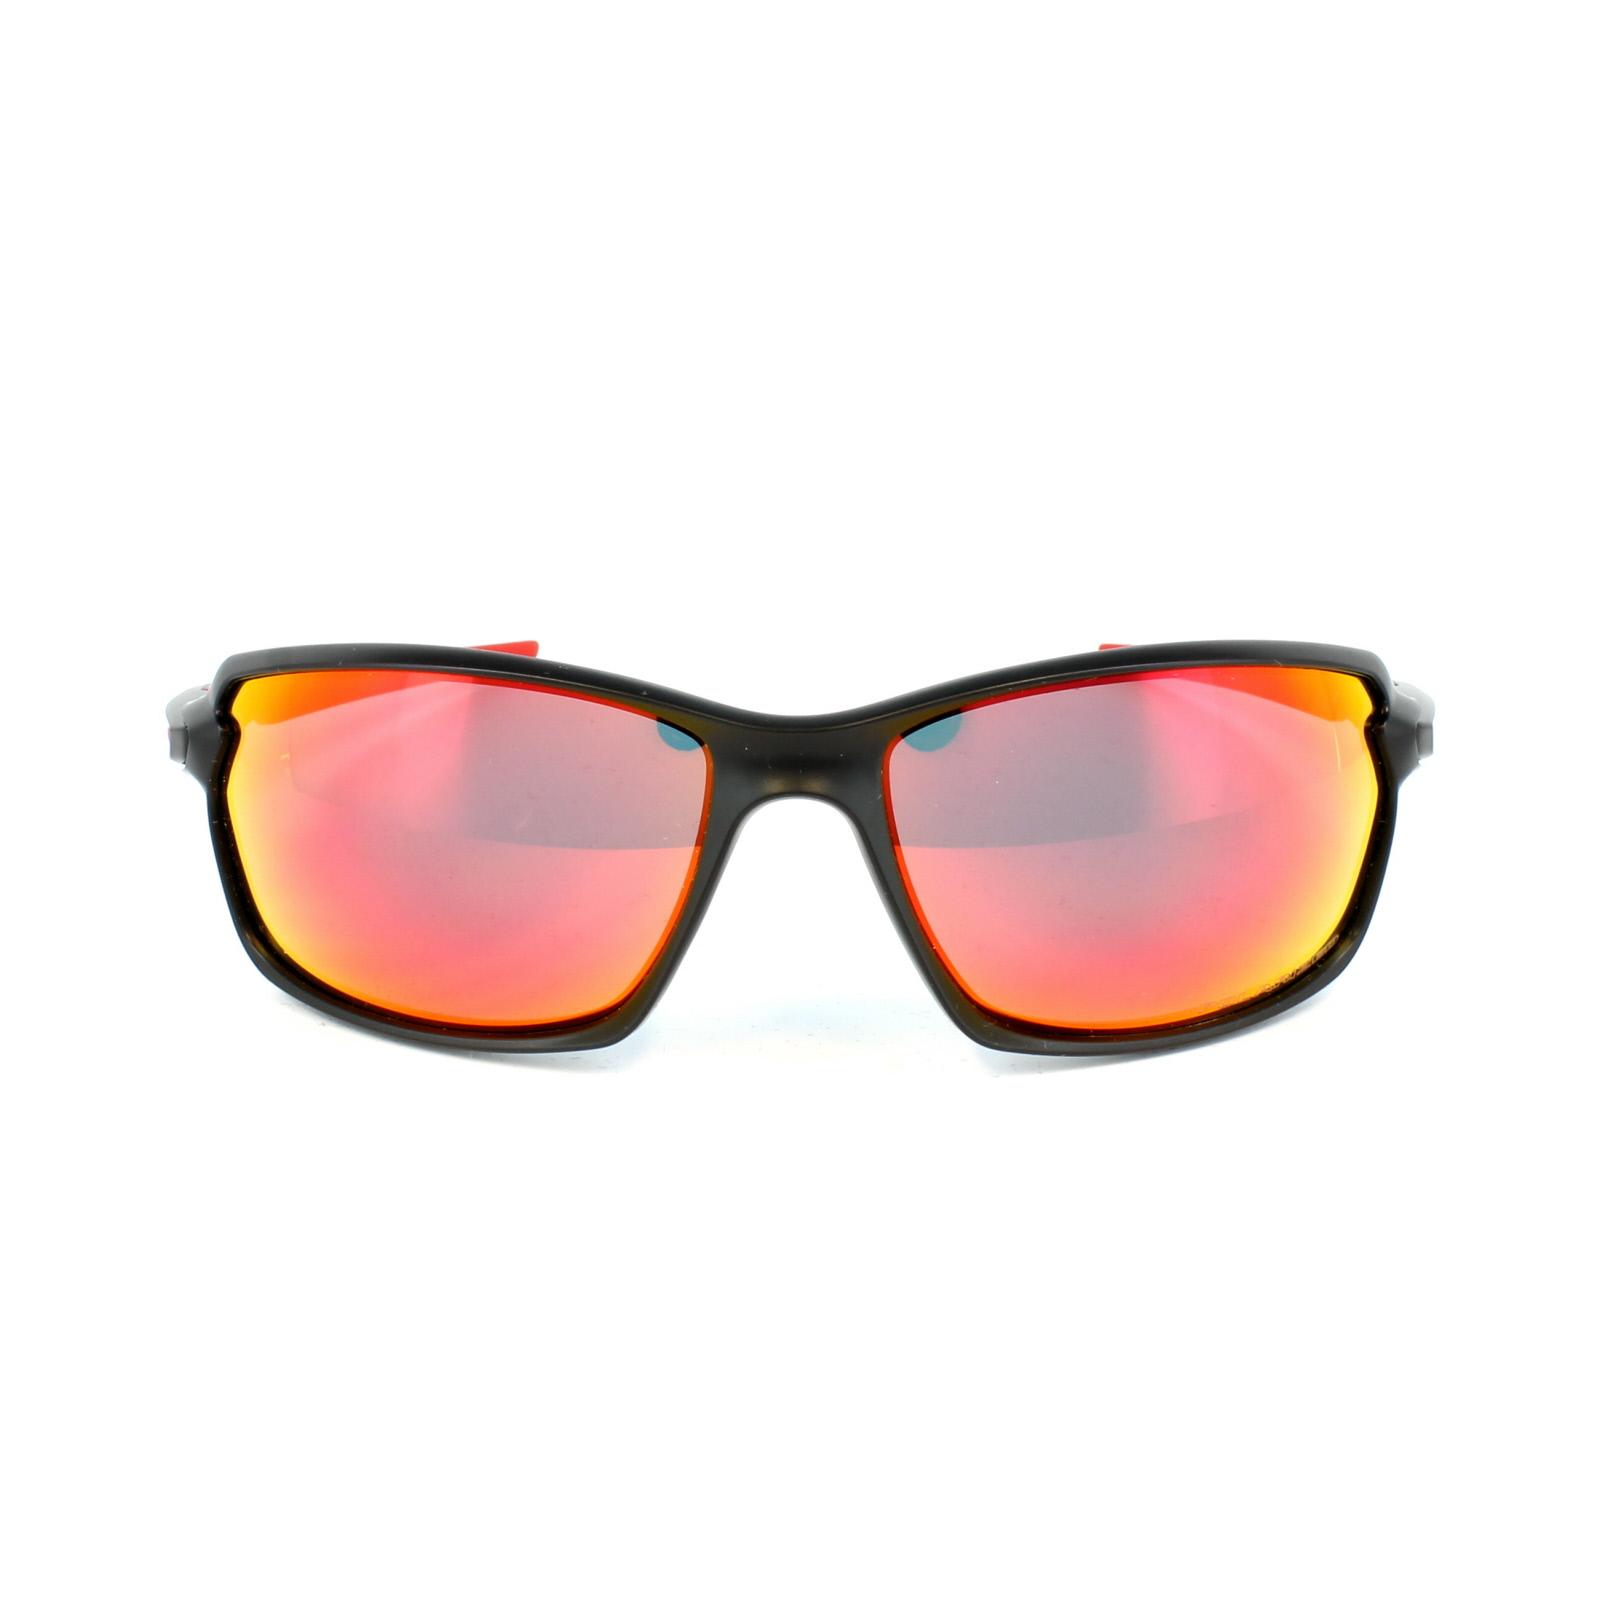 Cheap Oakley Carbon Shift Sunglasses Discounted Sunglasses